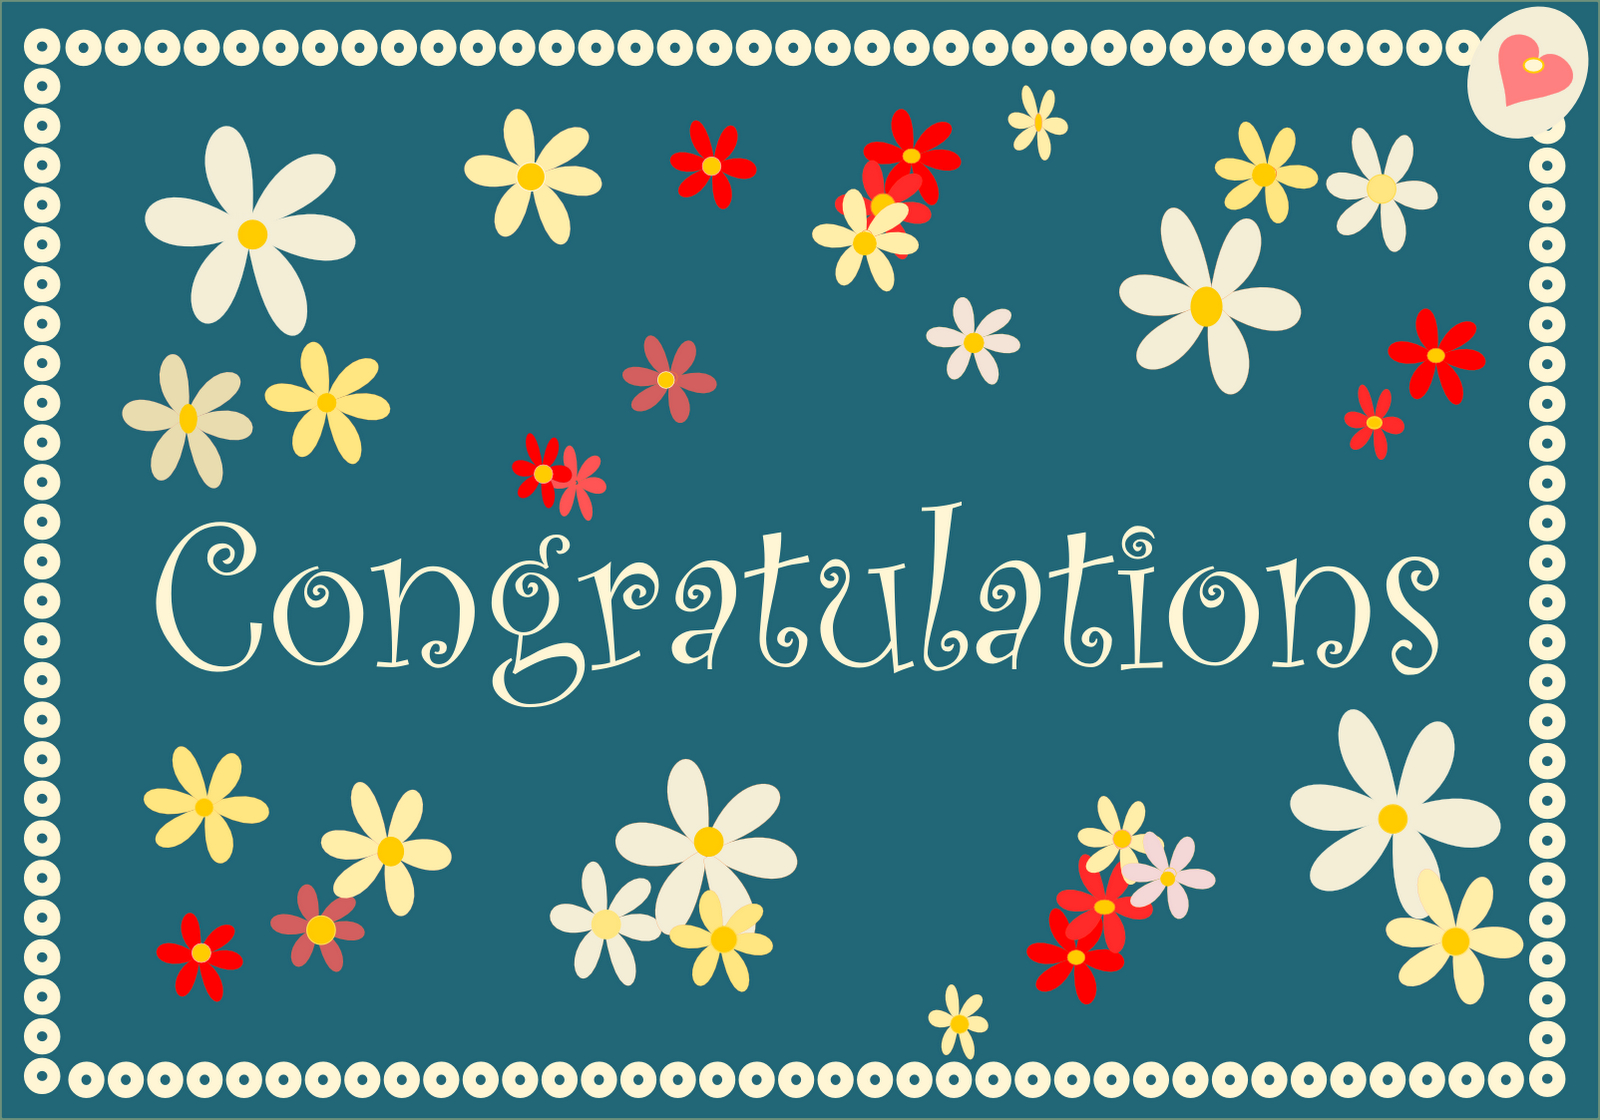 Free Printable Congratulations Cards In Retro Colors - Ausdruckbare - Free Printable Congratulations Cards